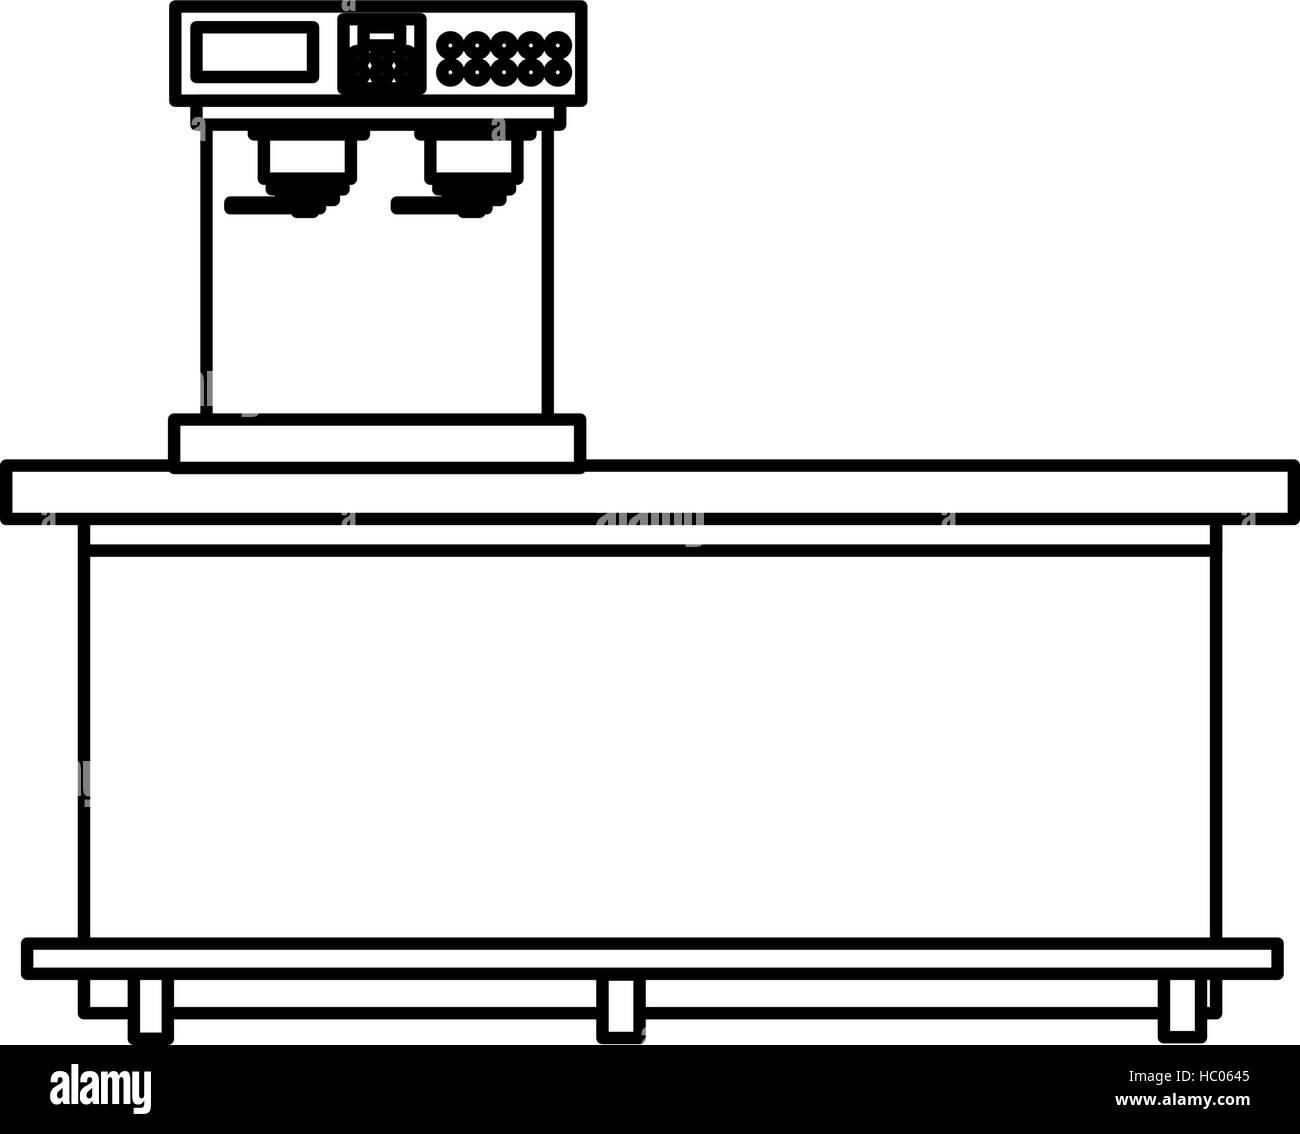 Isolated Coffee Machine Design Stock Vector Art Illustration Diagram